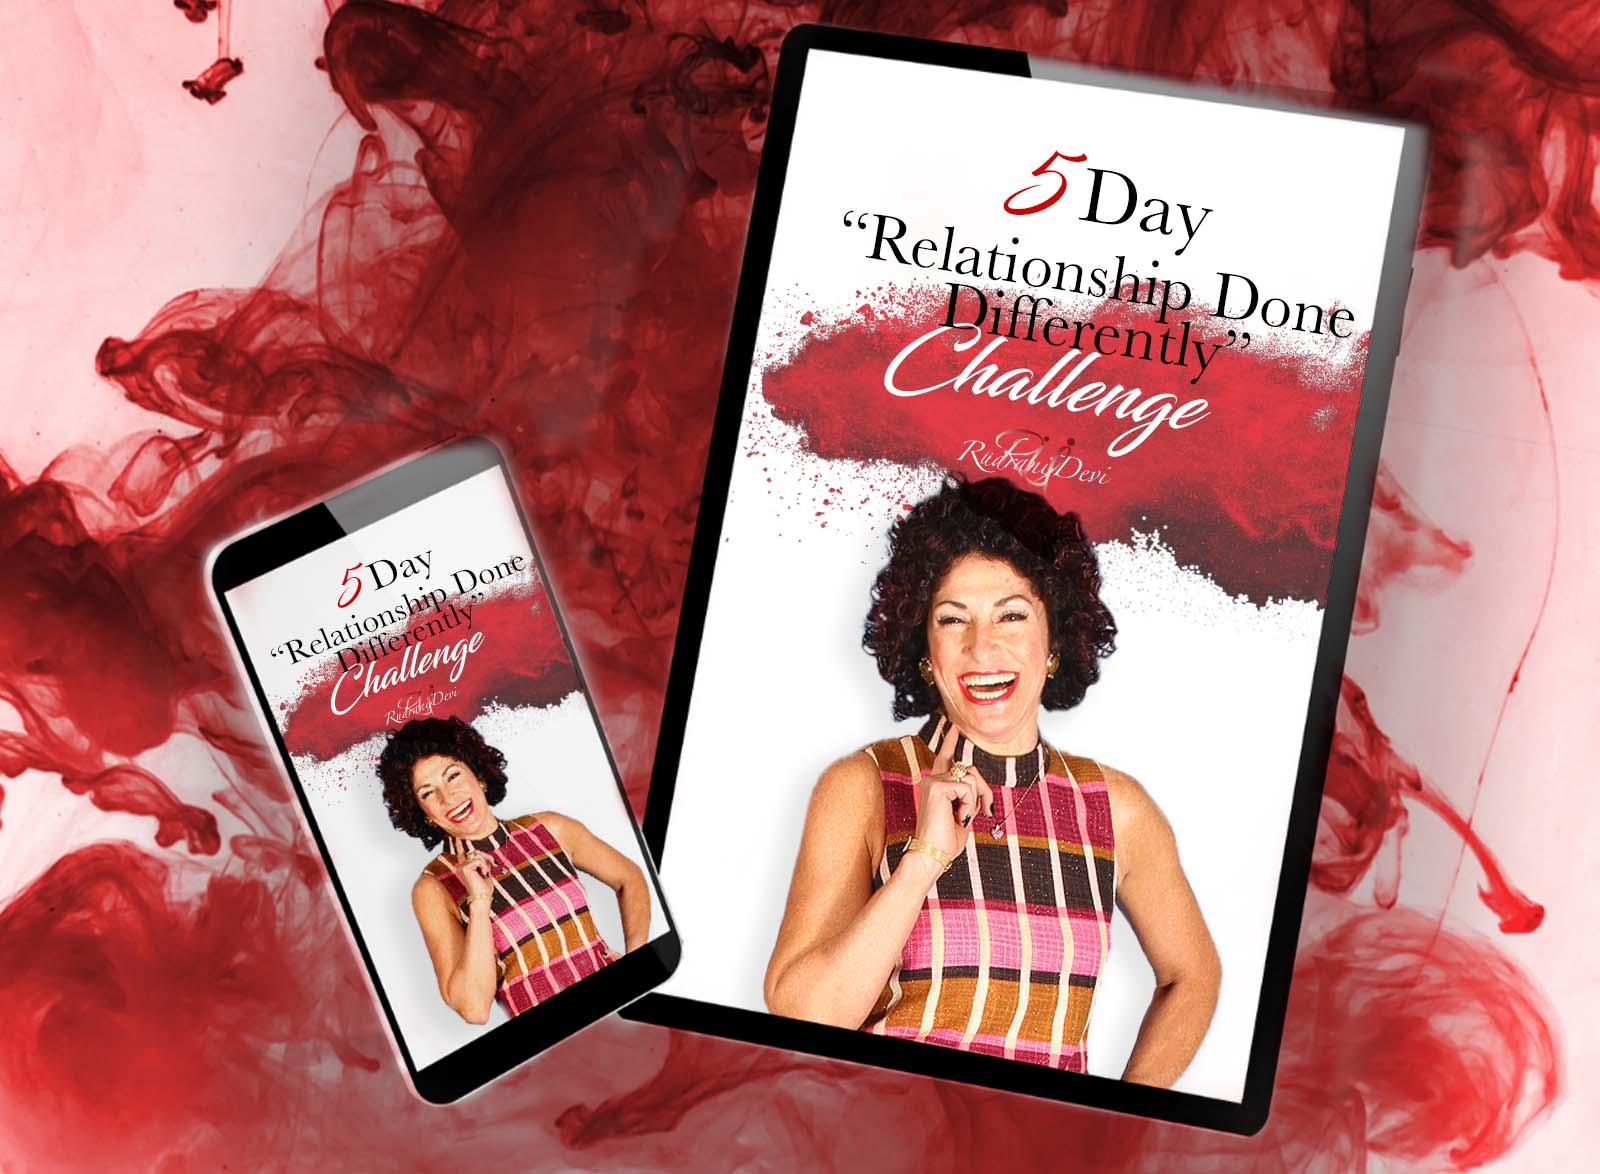 https://rudranidevi.com/wp-content/uploads/2021/04/5-Day-Challenge.jpg